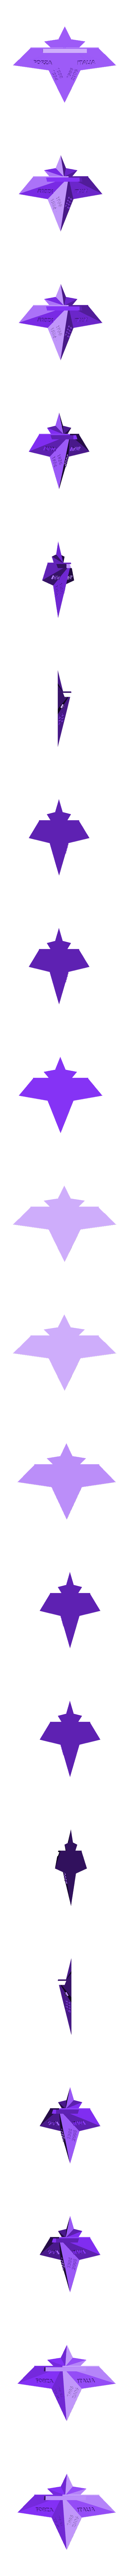 SUPPORT-BASE-V3-FORZA-ITA-DATE-OK.stl Télécharger fichier STL Logo italia figc • Objet imprimable en 3D, zimatera